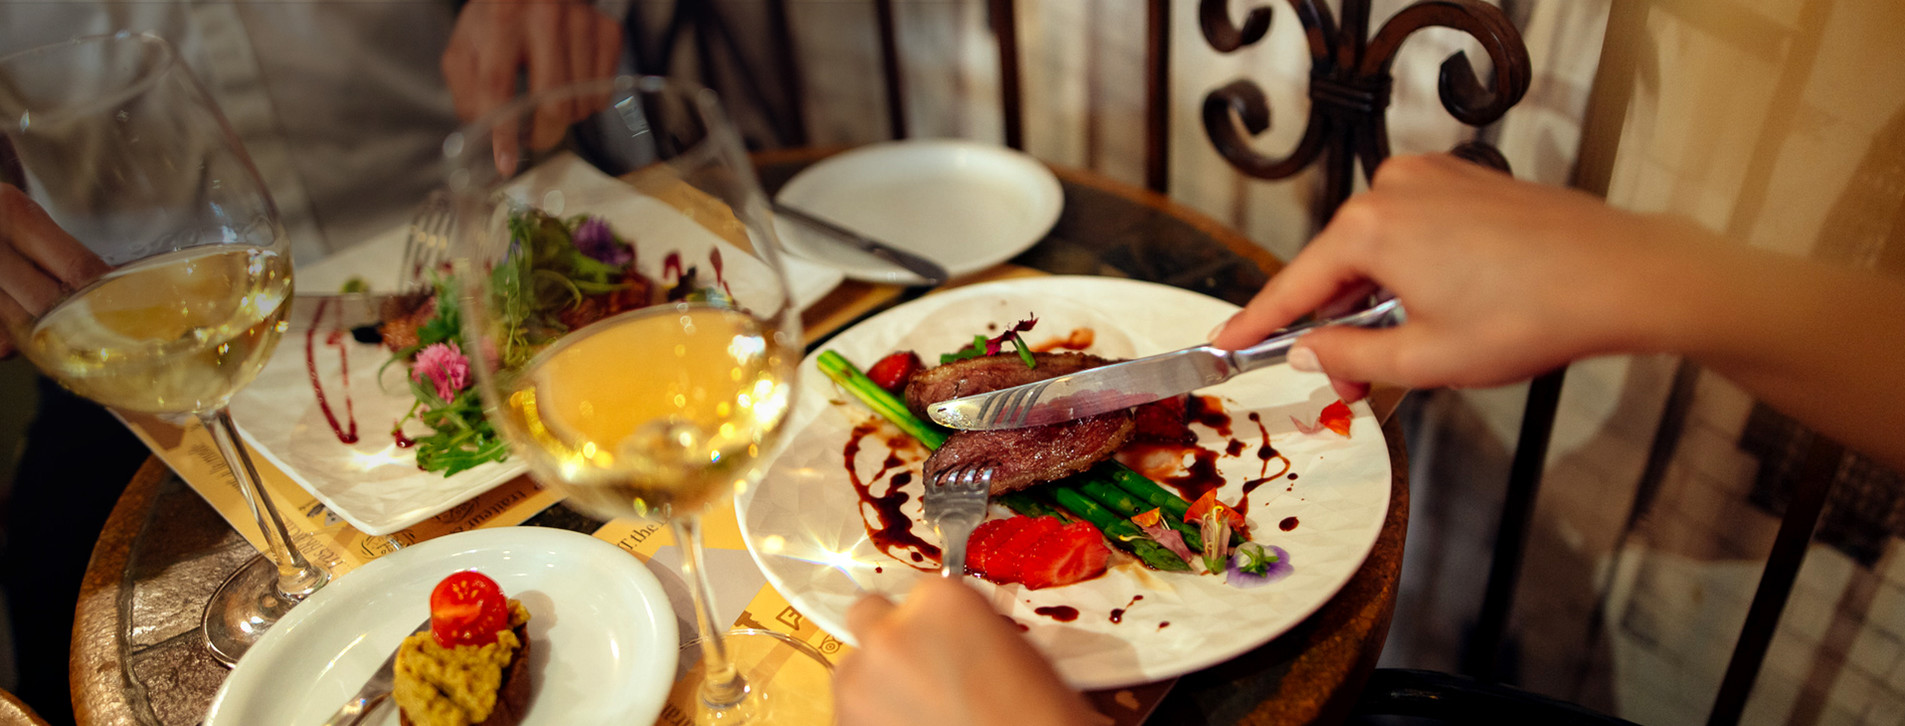 Фото - Ужин во французском ресторане